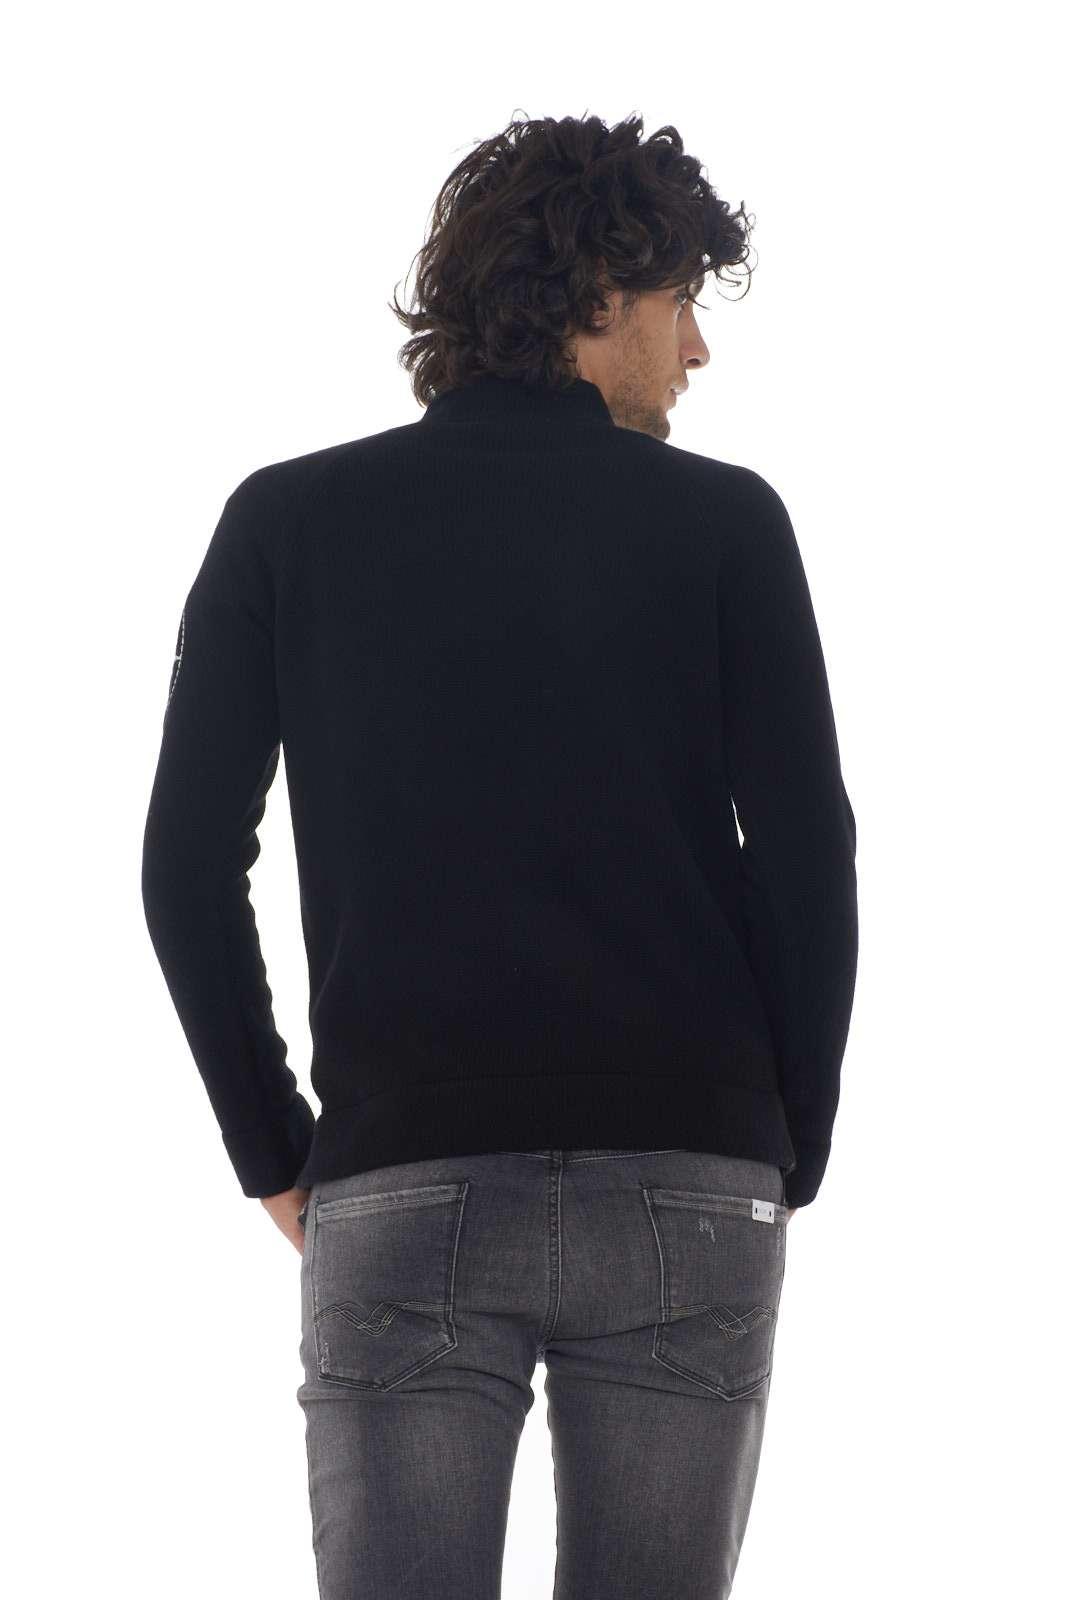 https://www.parmax.com/media/catalog/product/a/i/AI-outlet_parmax-maglia-uomo-Stone-Island-7115548C7-C.jpg